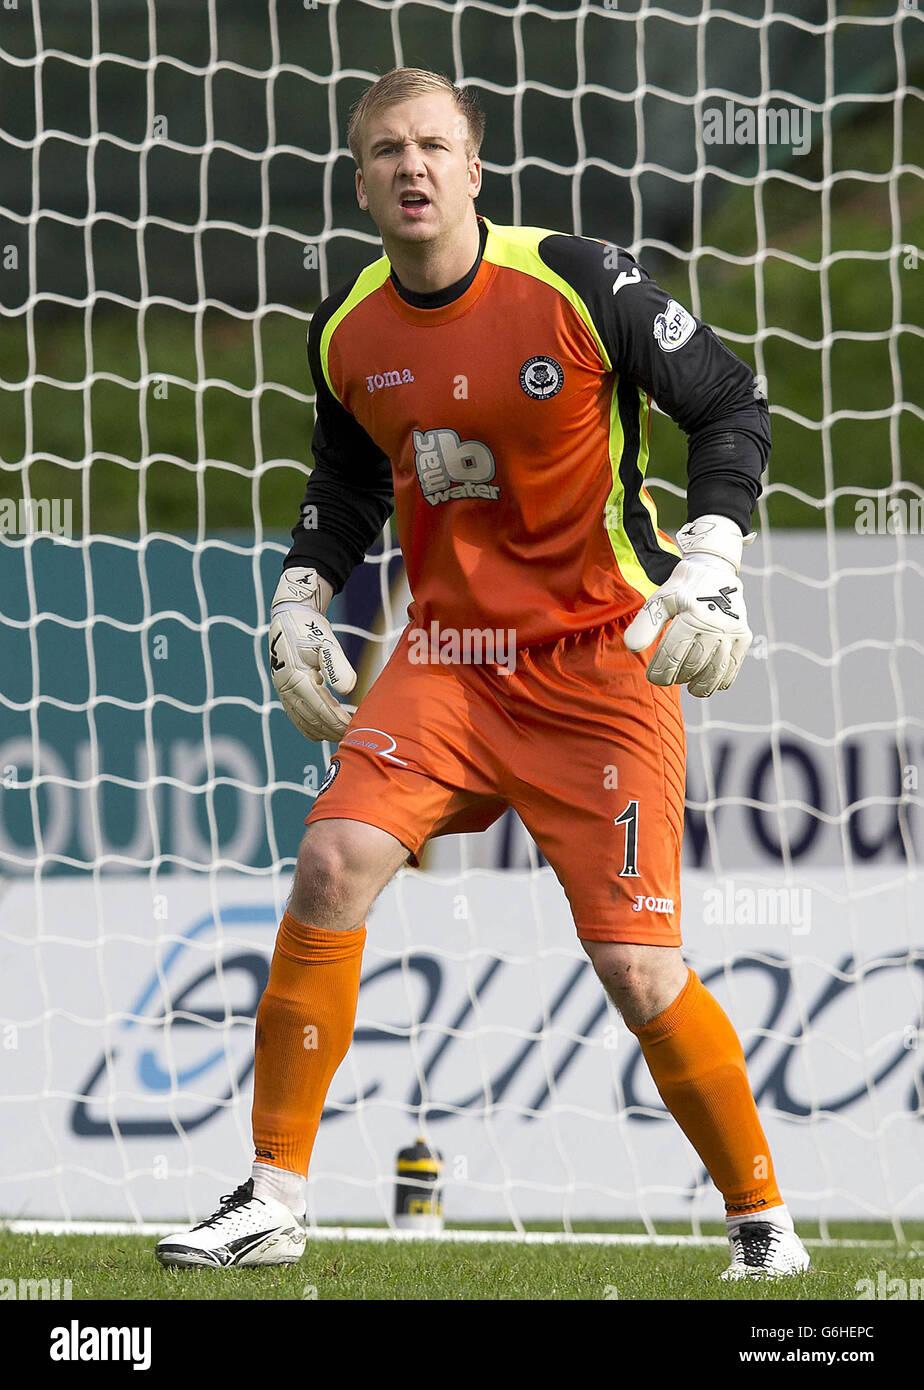 Soccer - Scottish Premiership - Partick Thistle v Celtic - Firhill - Stock Image